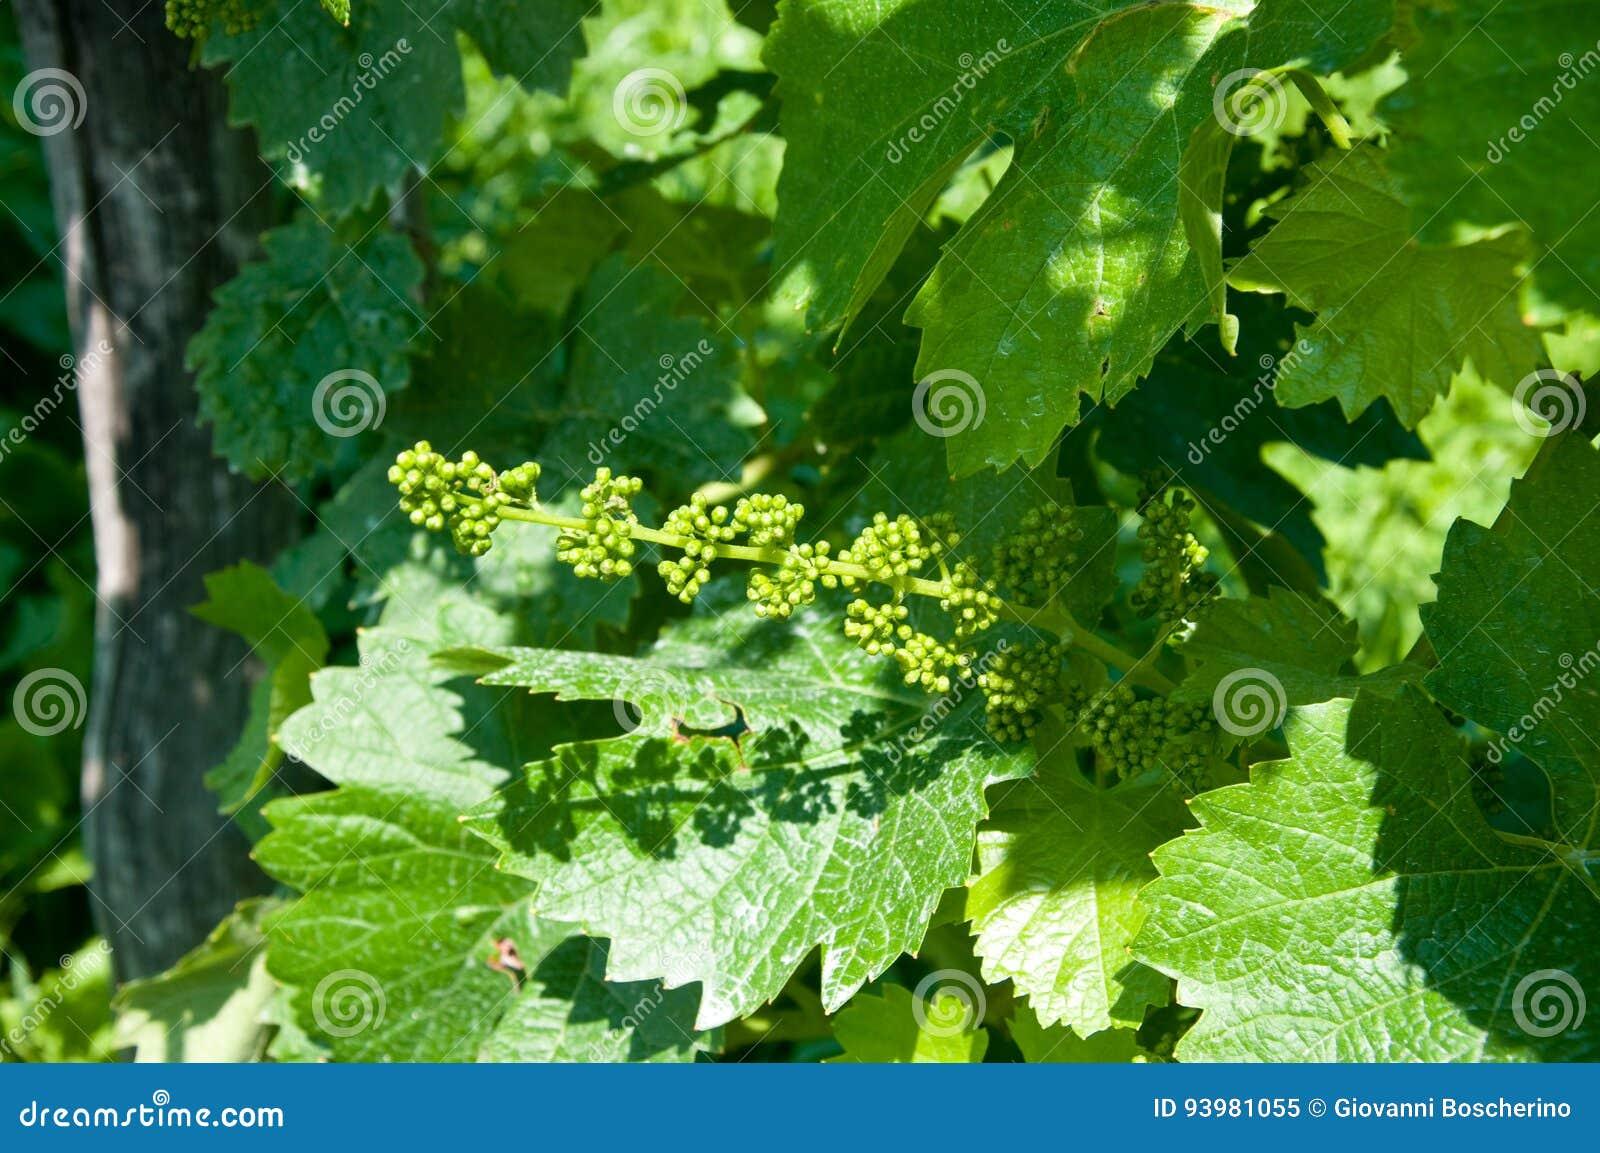 Kleine groene proseccobossen in Italië dichtbij valdobbiadene